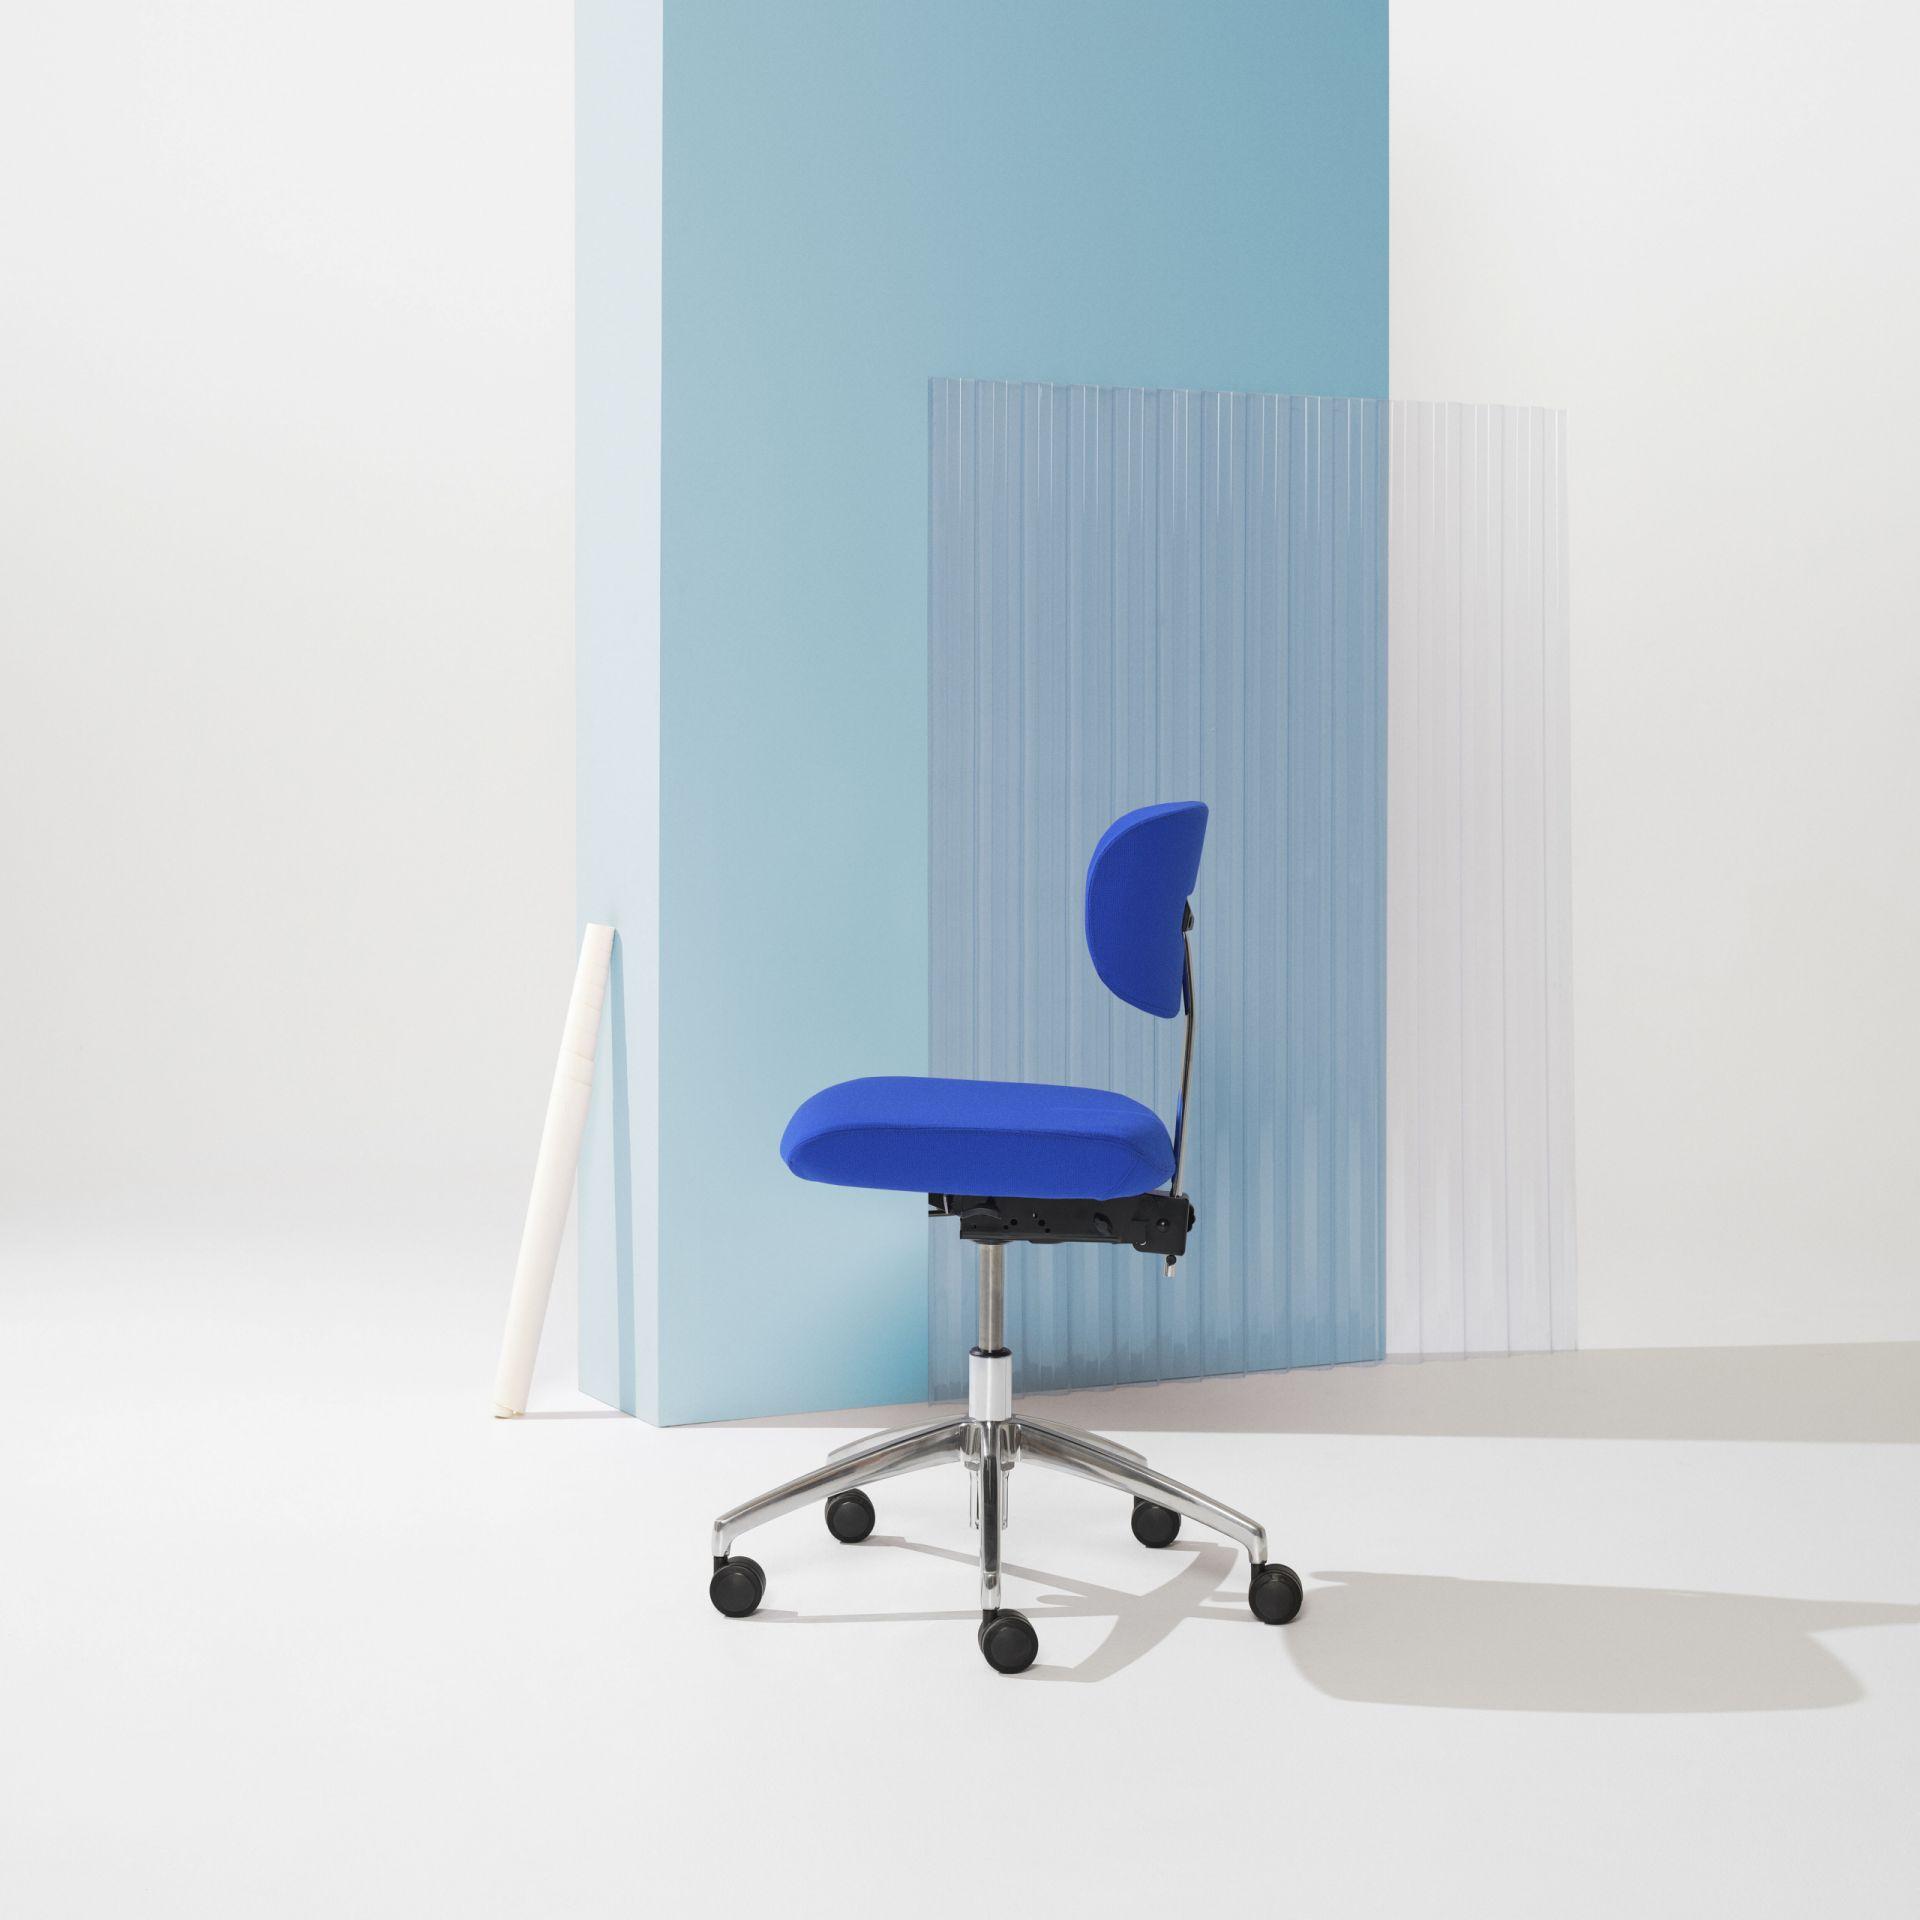 Savo Studio Studio mötesstol produktbild 2